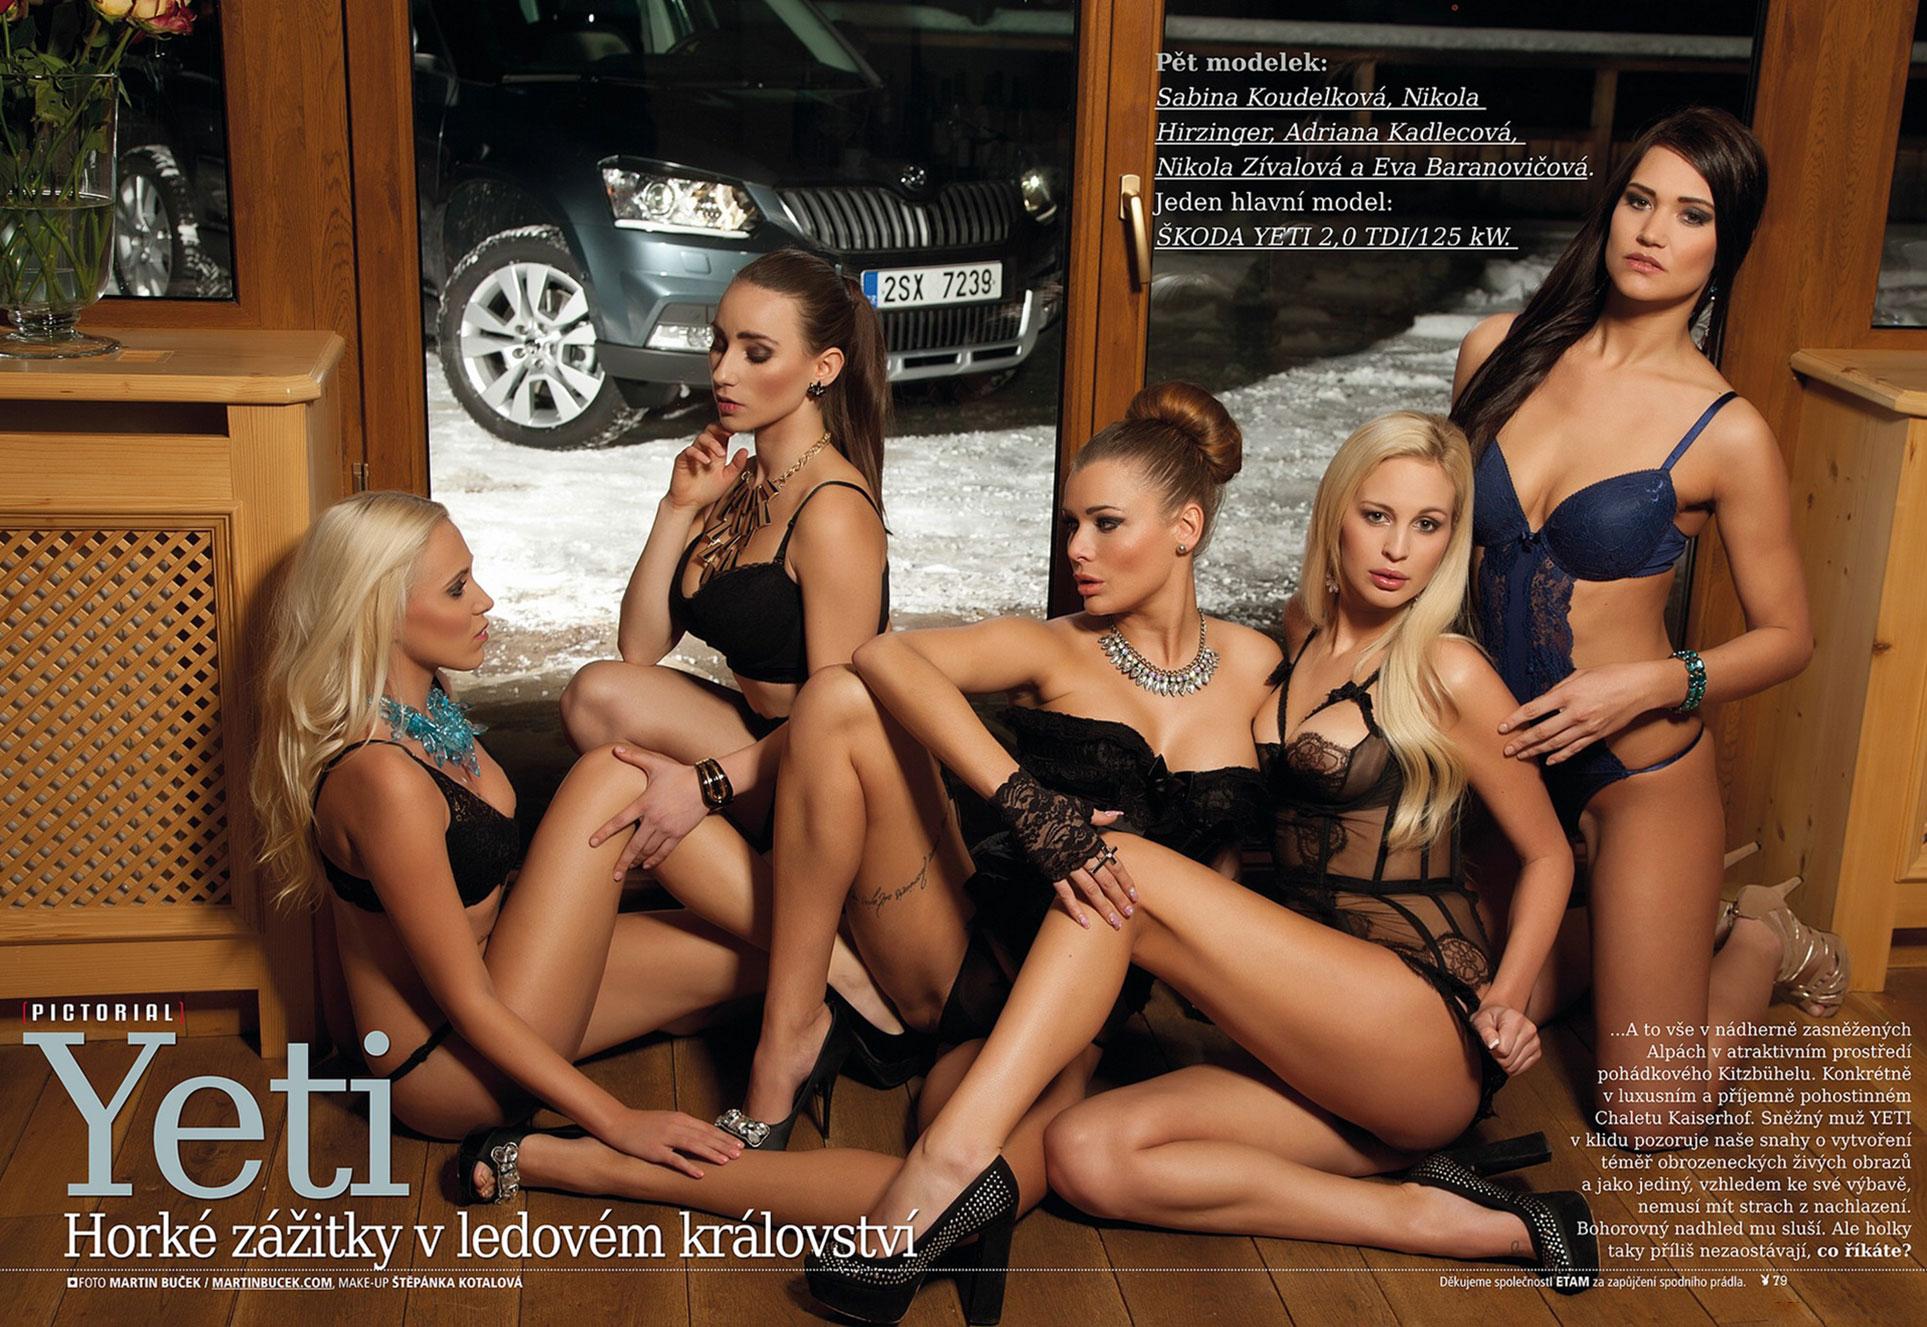 Nikola Hirzinger, Adriana Kadlecova, Eva Baranovicova, Sabina Koudelkova, Nikola Zivalova by Martin Bucek / Playboy Czech Republic january-february 2014